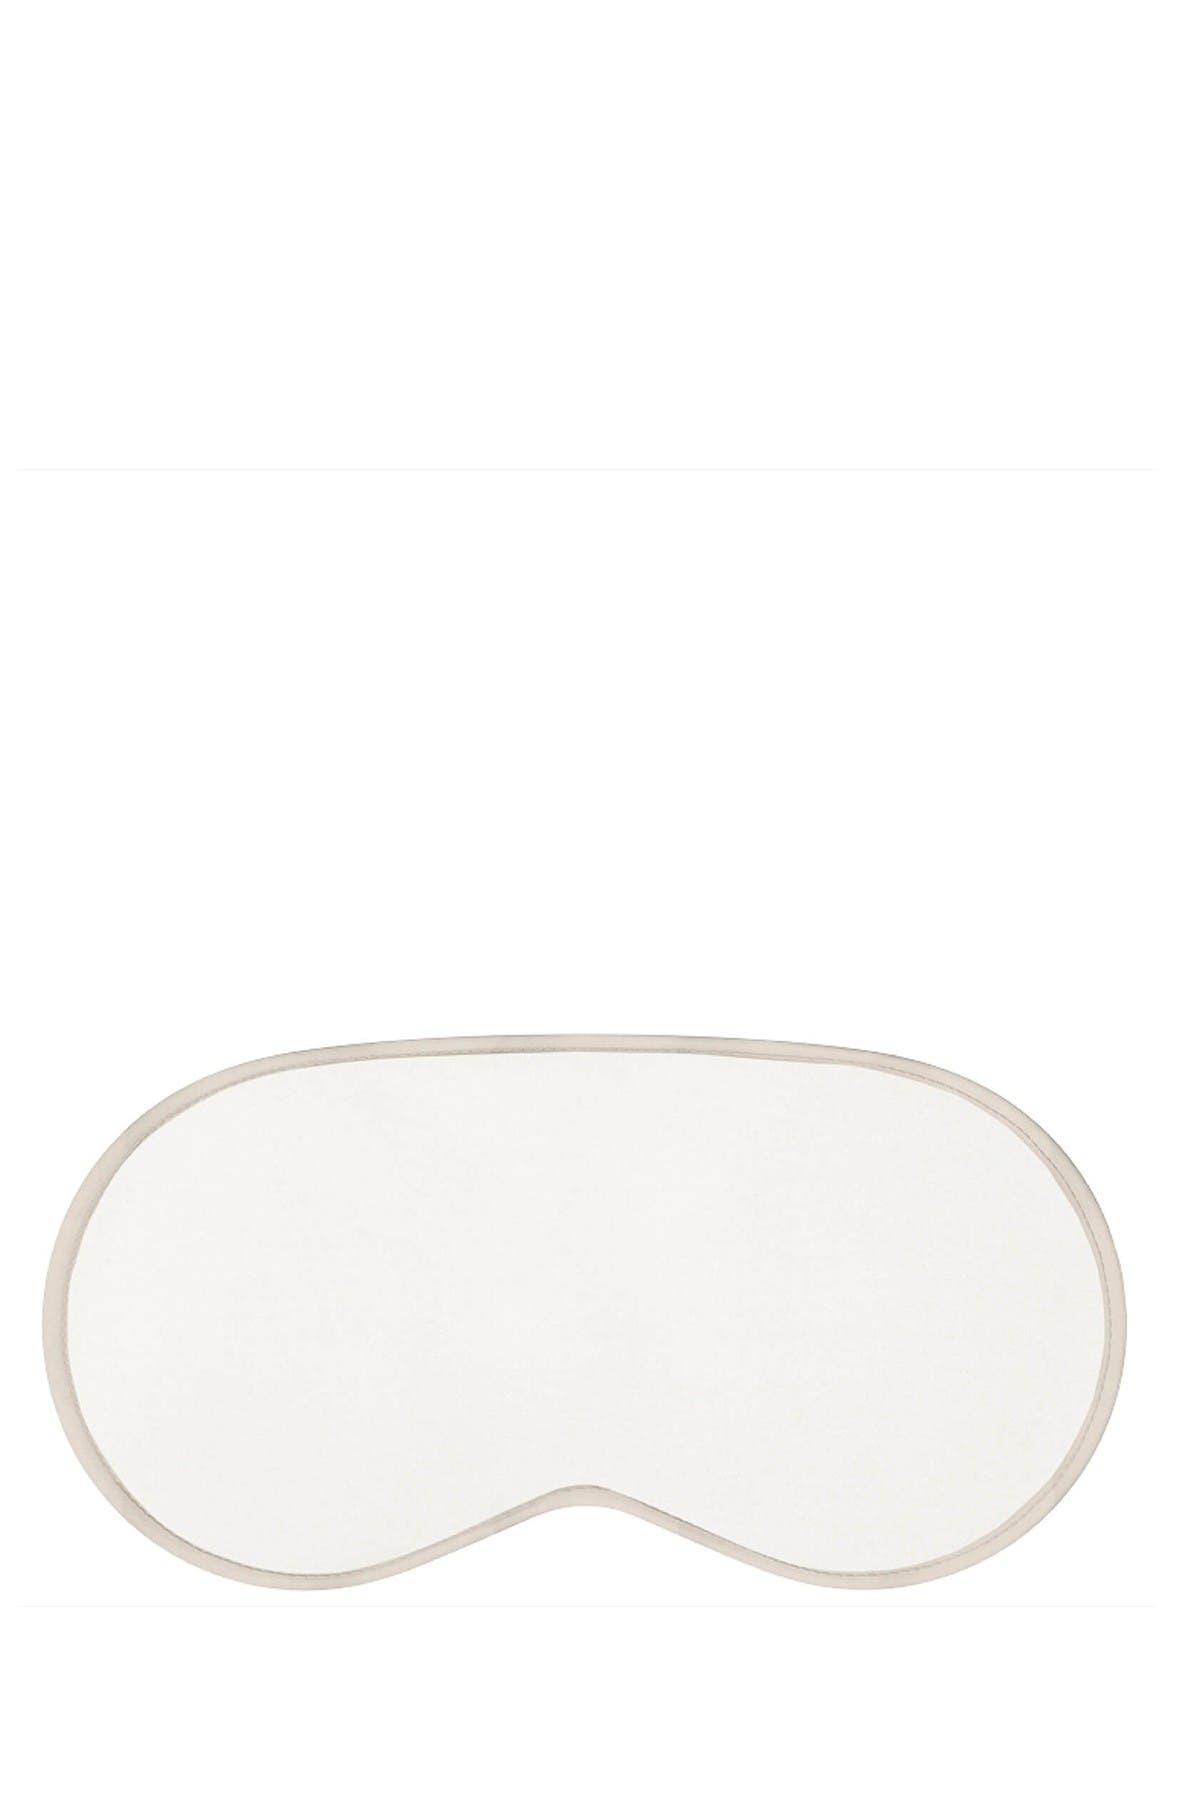 Iluminage Beauty Skin Rejuvenating Eye Mask with Anti-Aging Copper Technology - Ivory Color